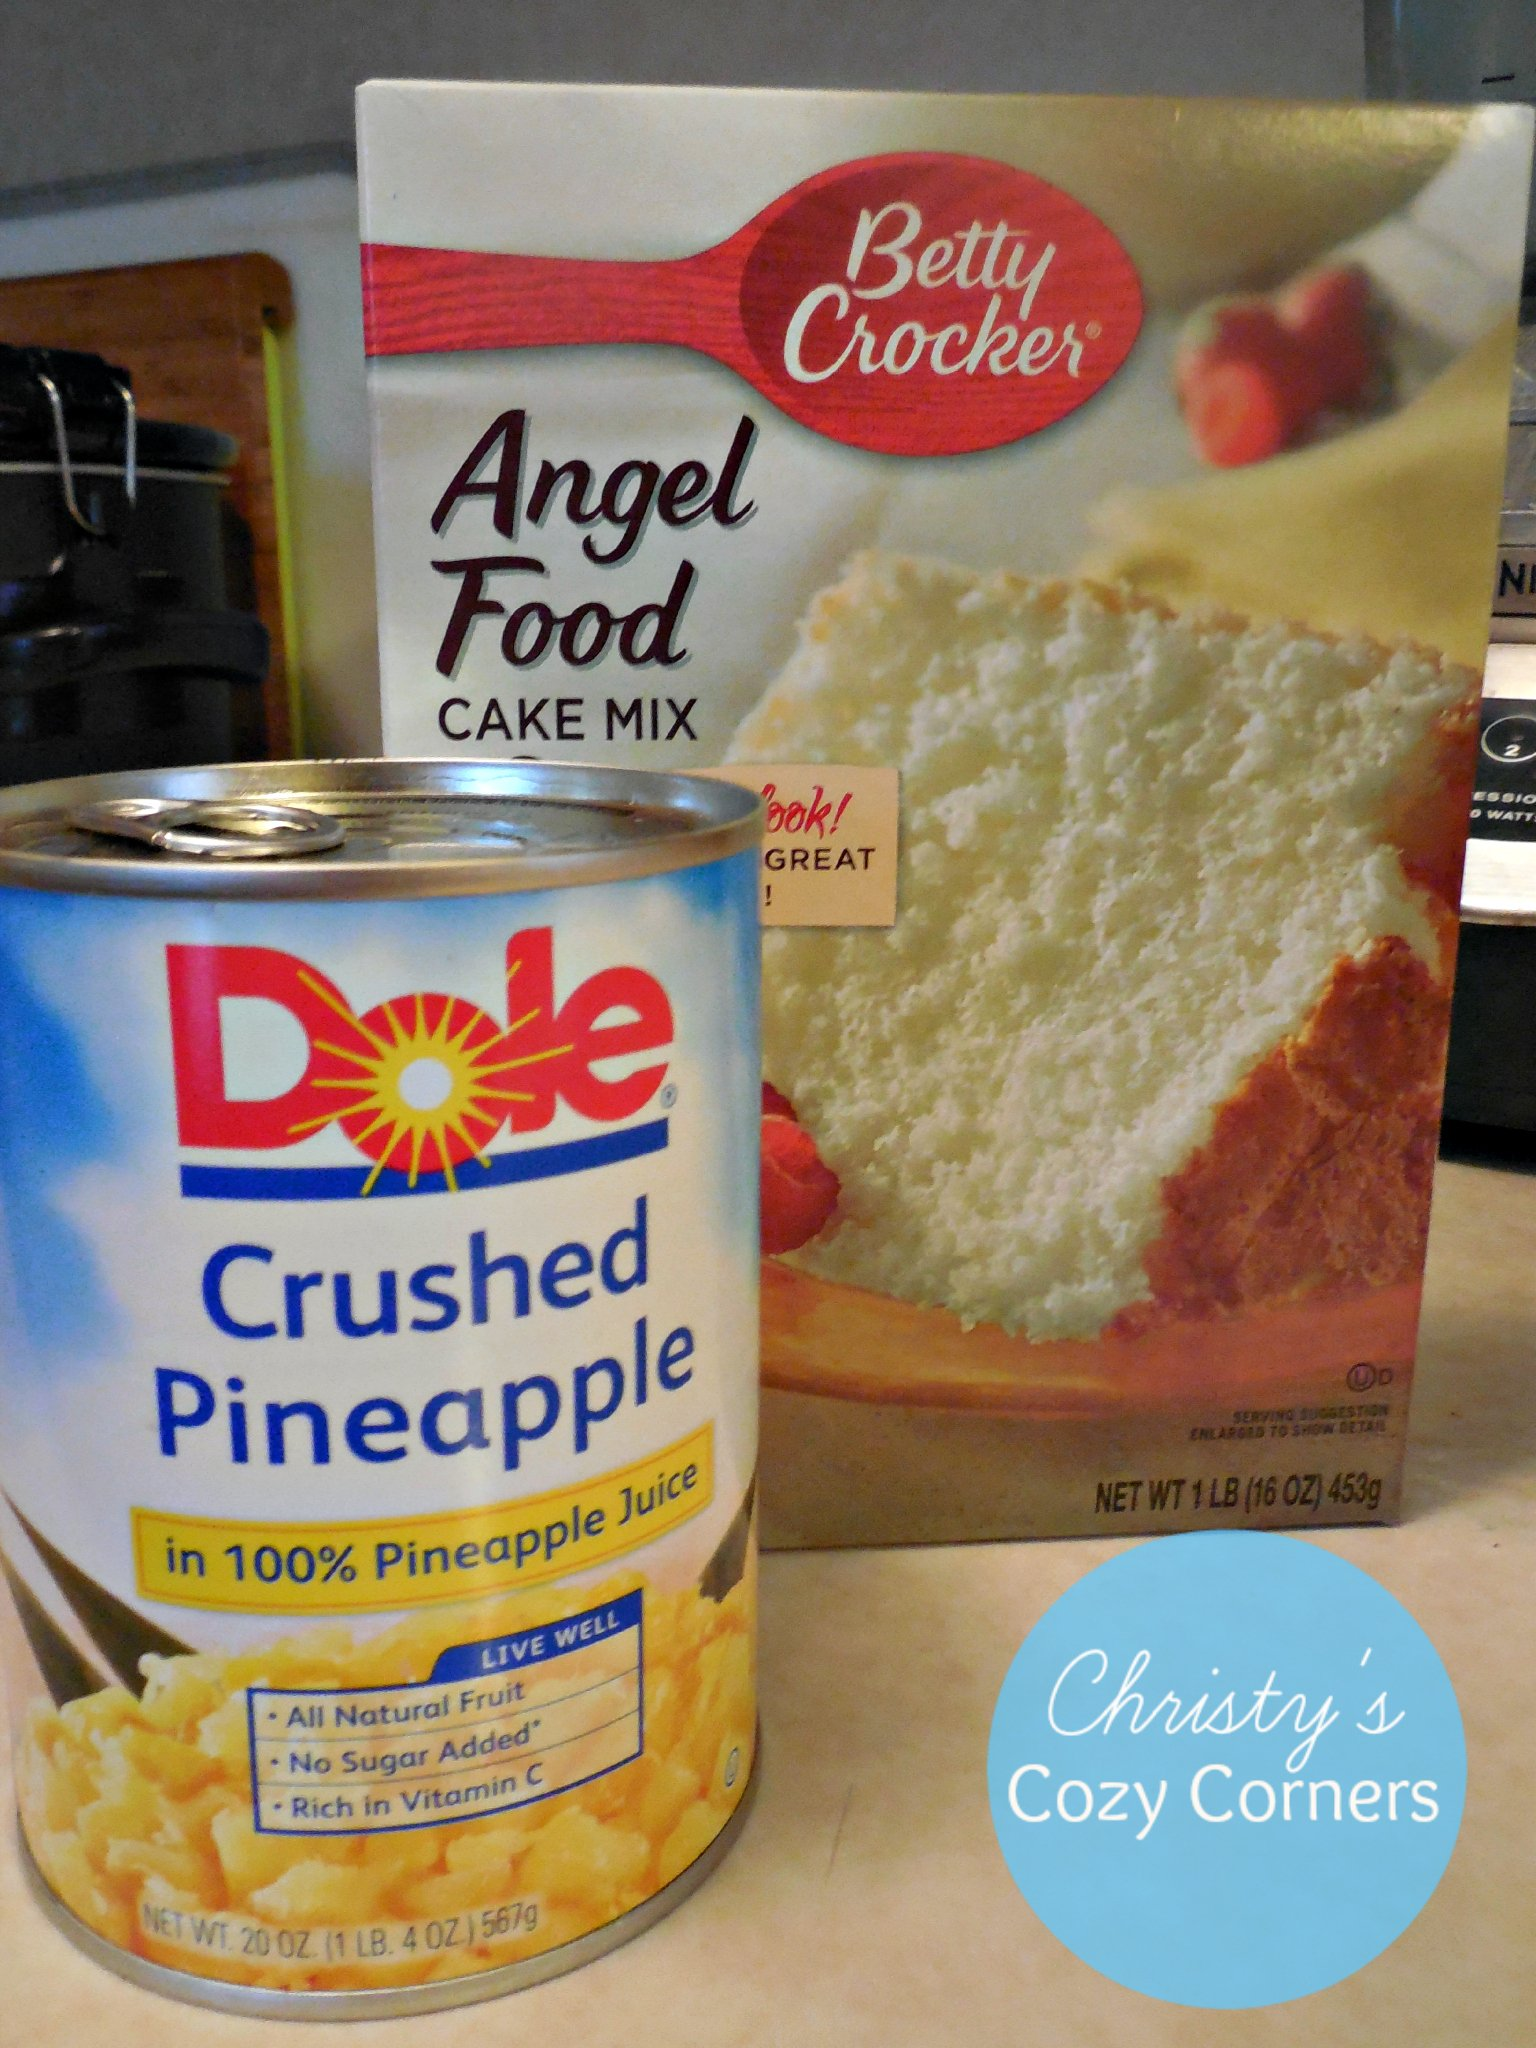 Dole Angel Food Cake Pineapple Cake